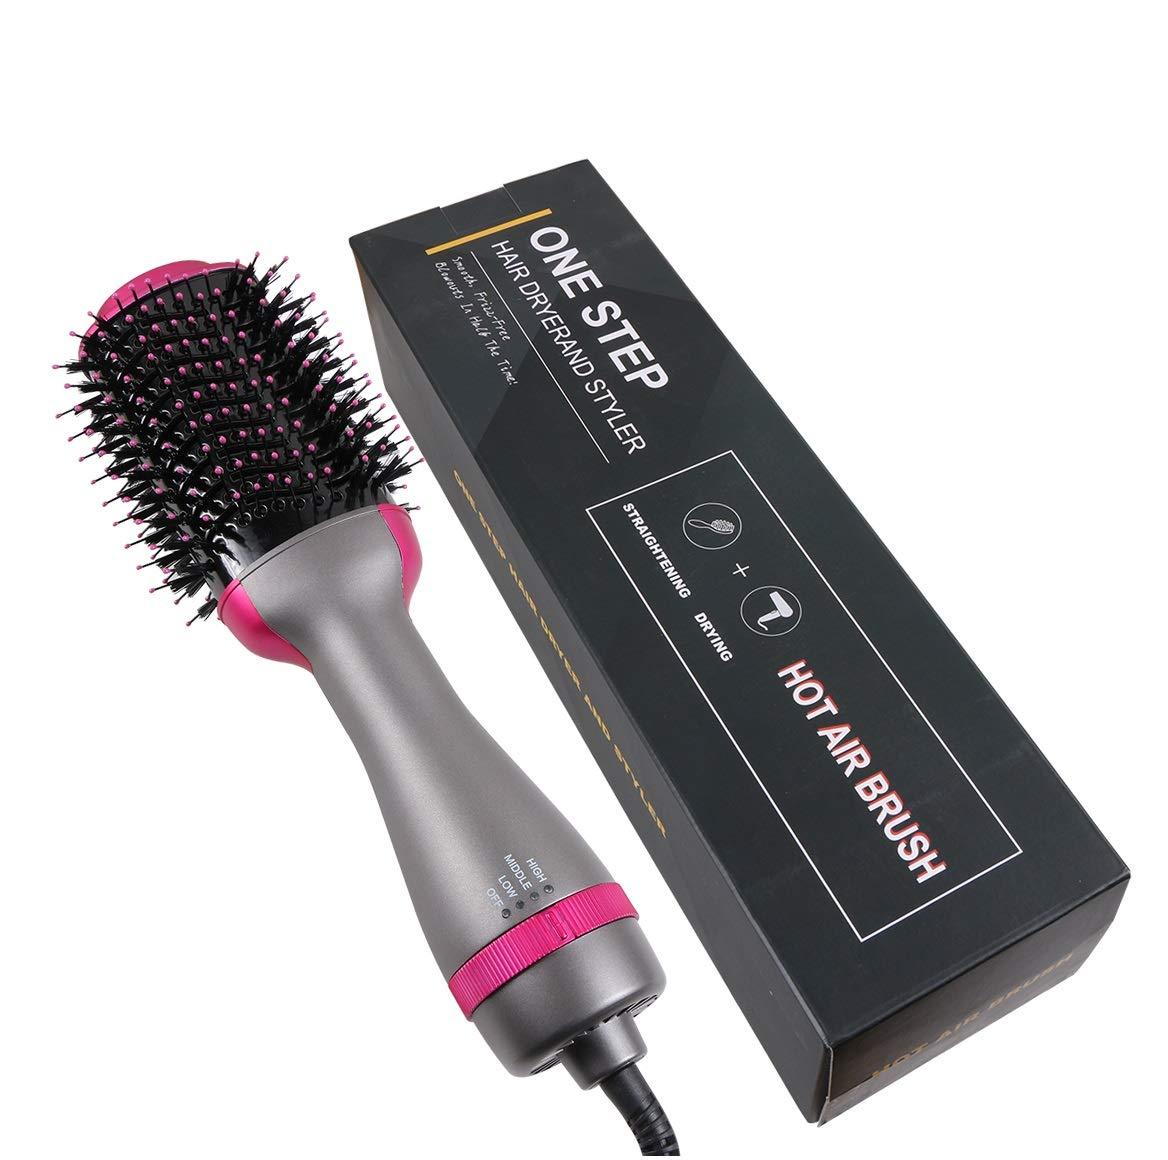 Hair Straightener and Curler Travel, Professional 2 IN 1 Hair Straightening Nano Titanium Iron Flat Iron LED Tools Curling Hair Straightener Curler Travel Auto Shut Off Women BlackRed